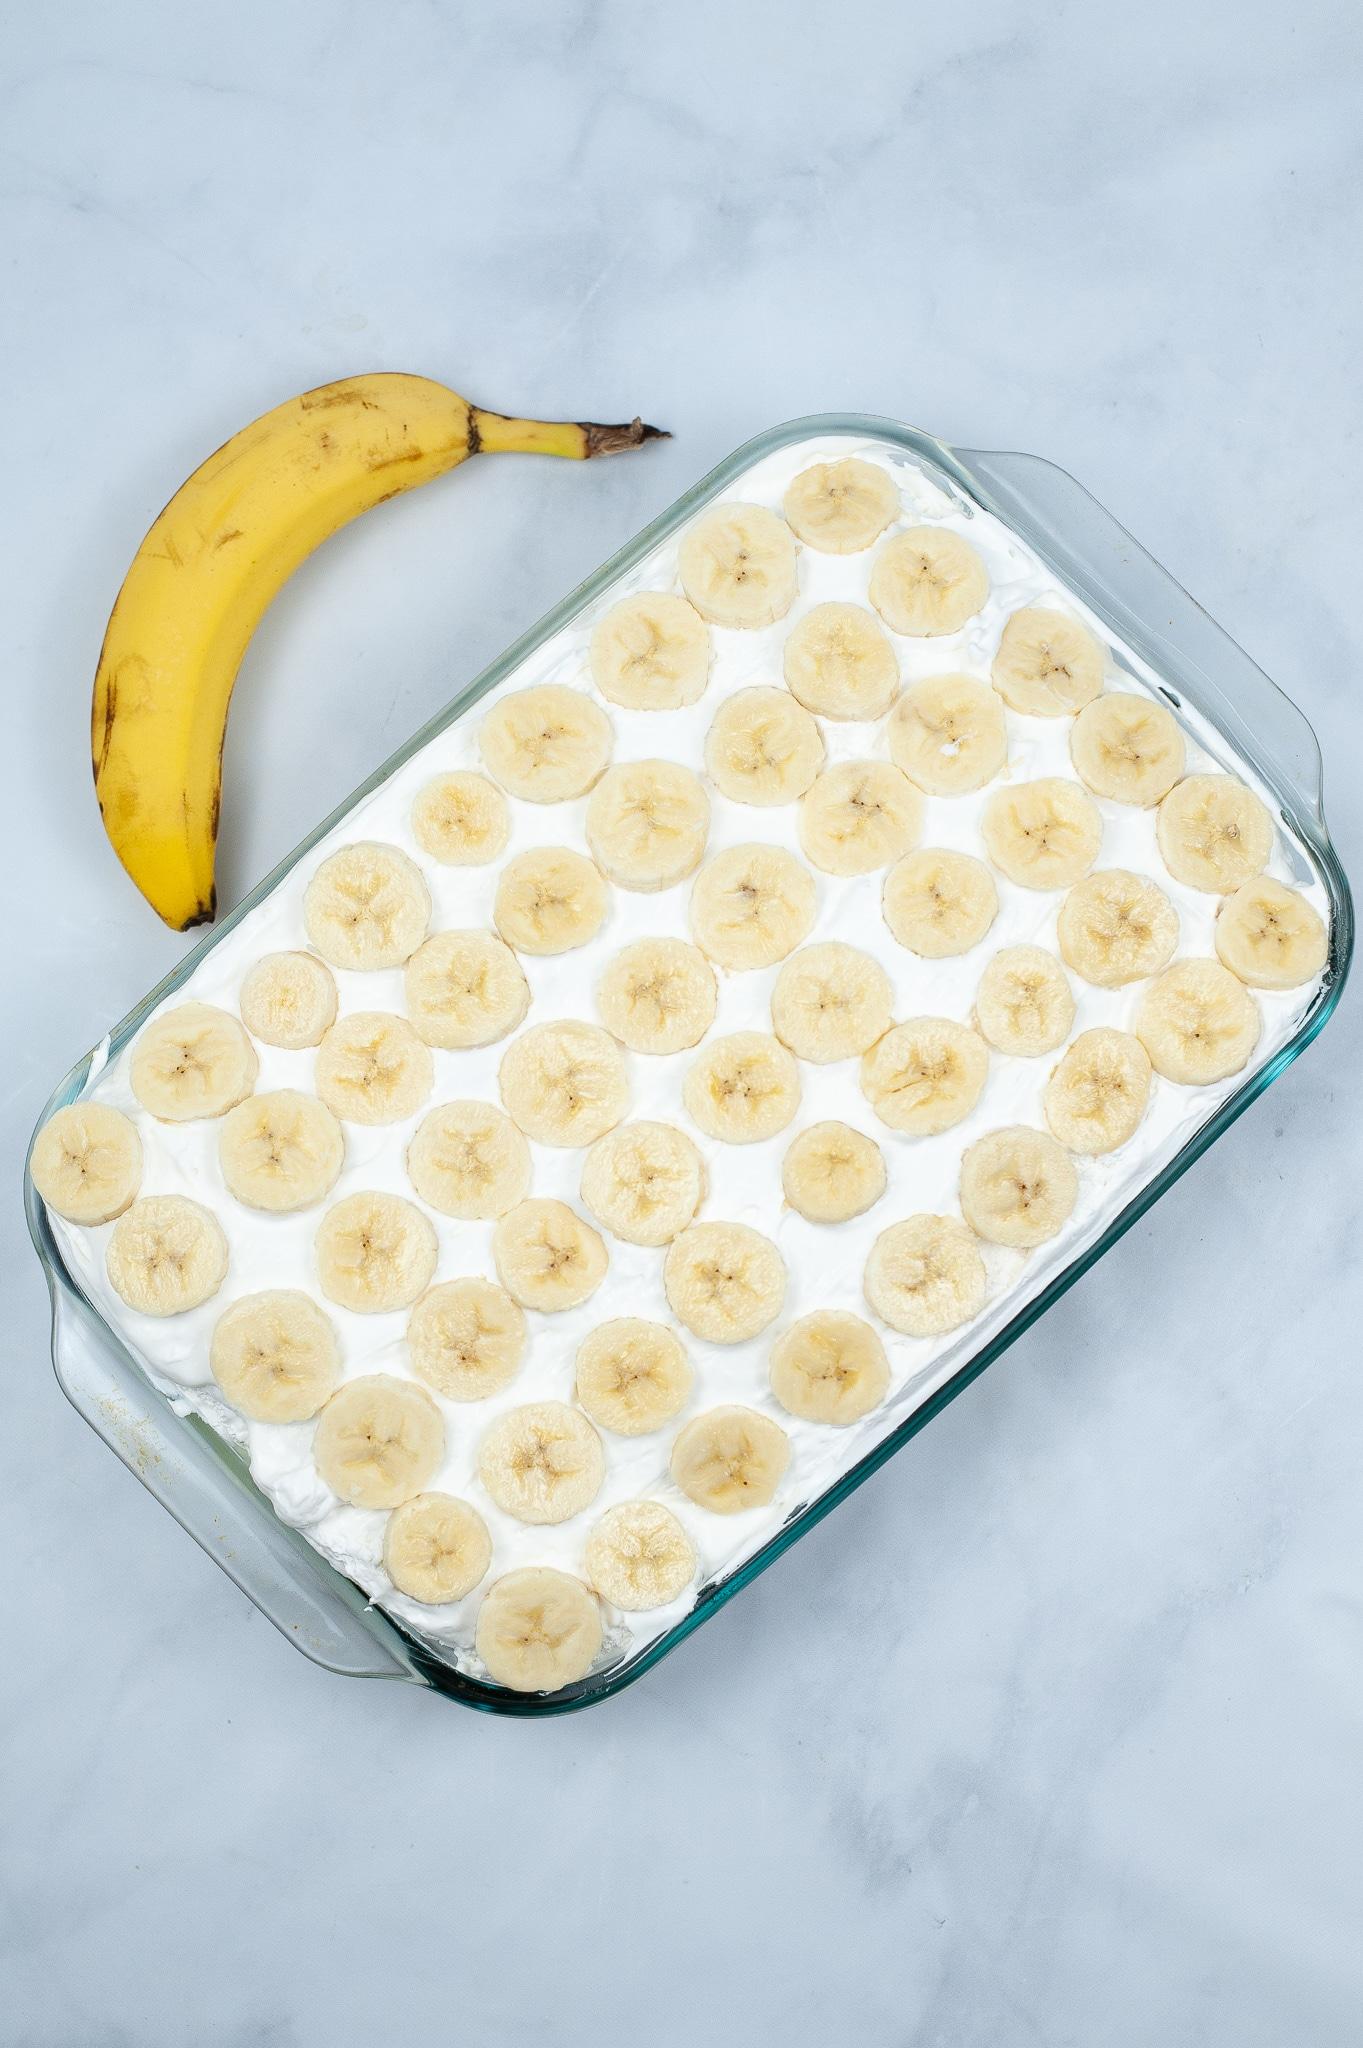 banana poke cake topped with bananas next to a banana